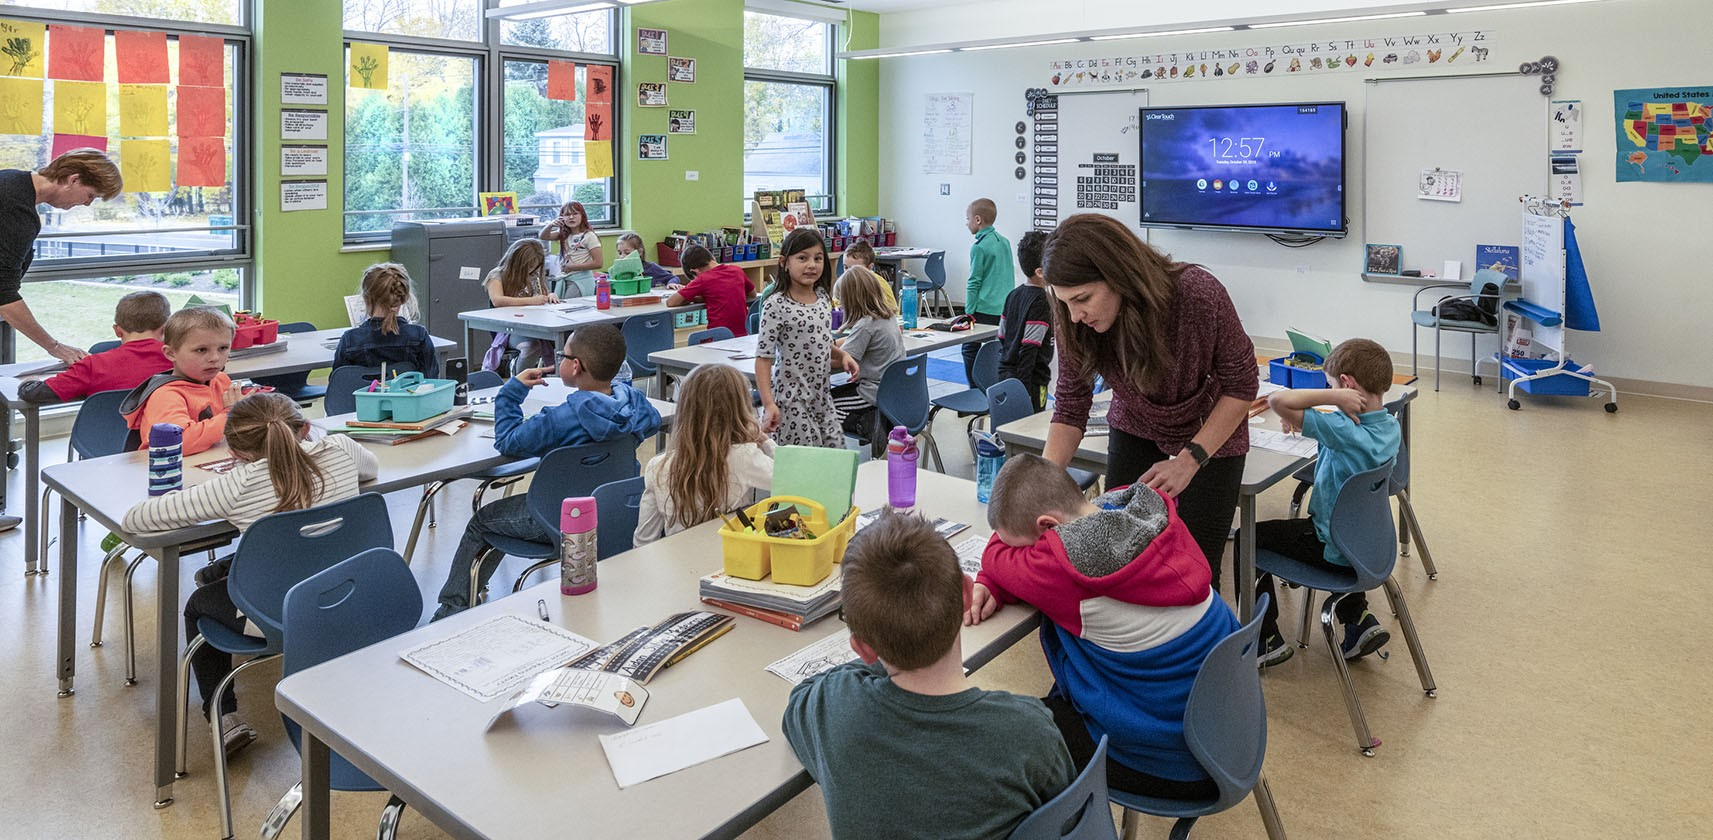 Templeton Elementary School Classrooms